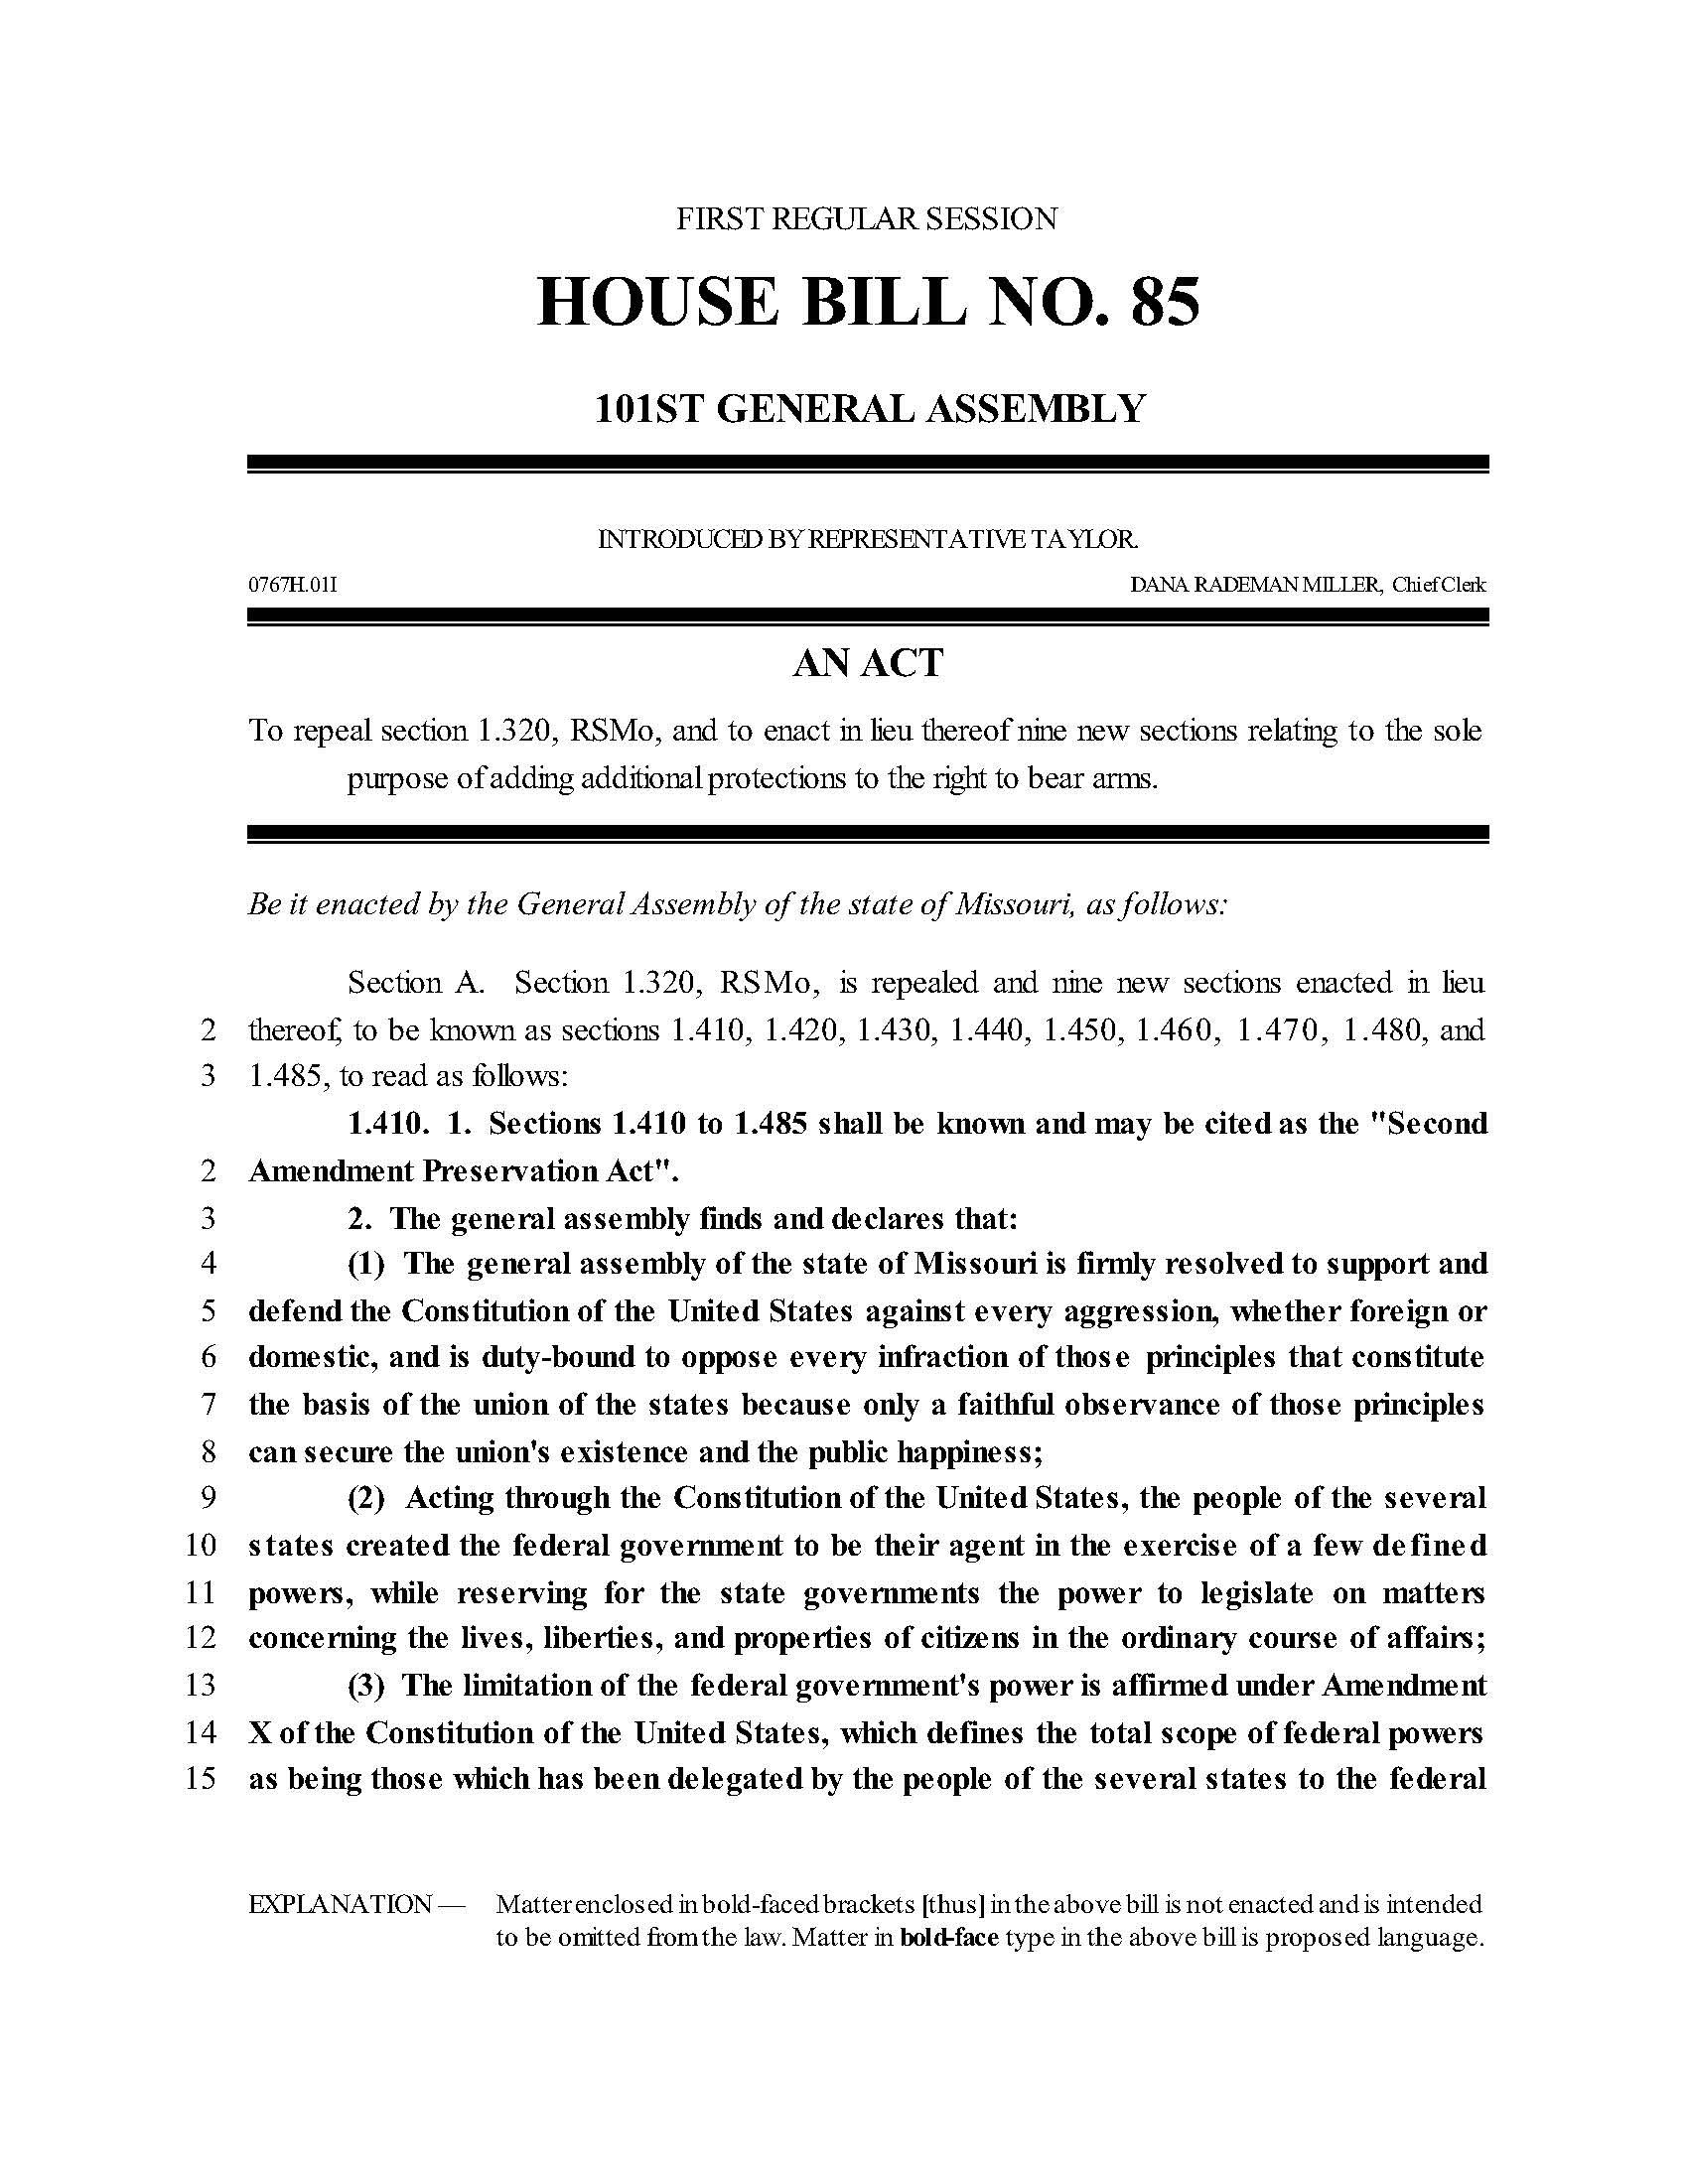 Missouri Second Amendment Preservation Act Page 1